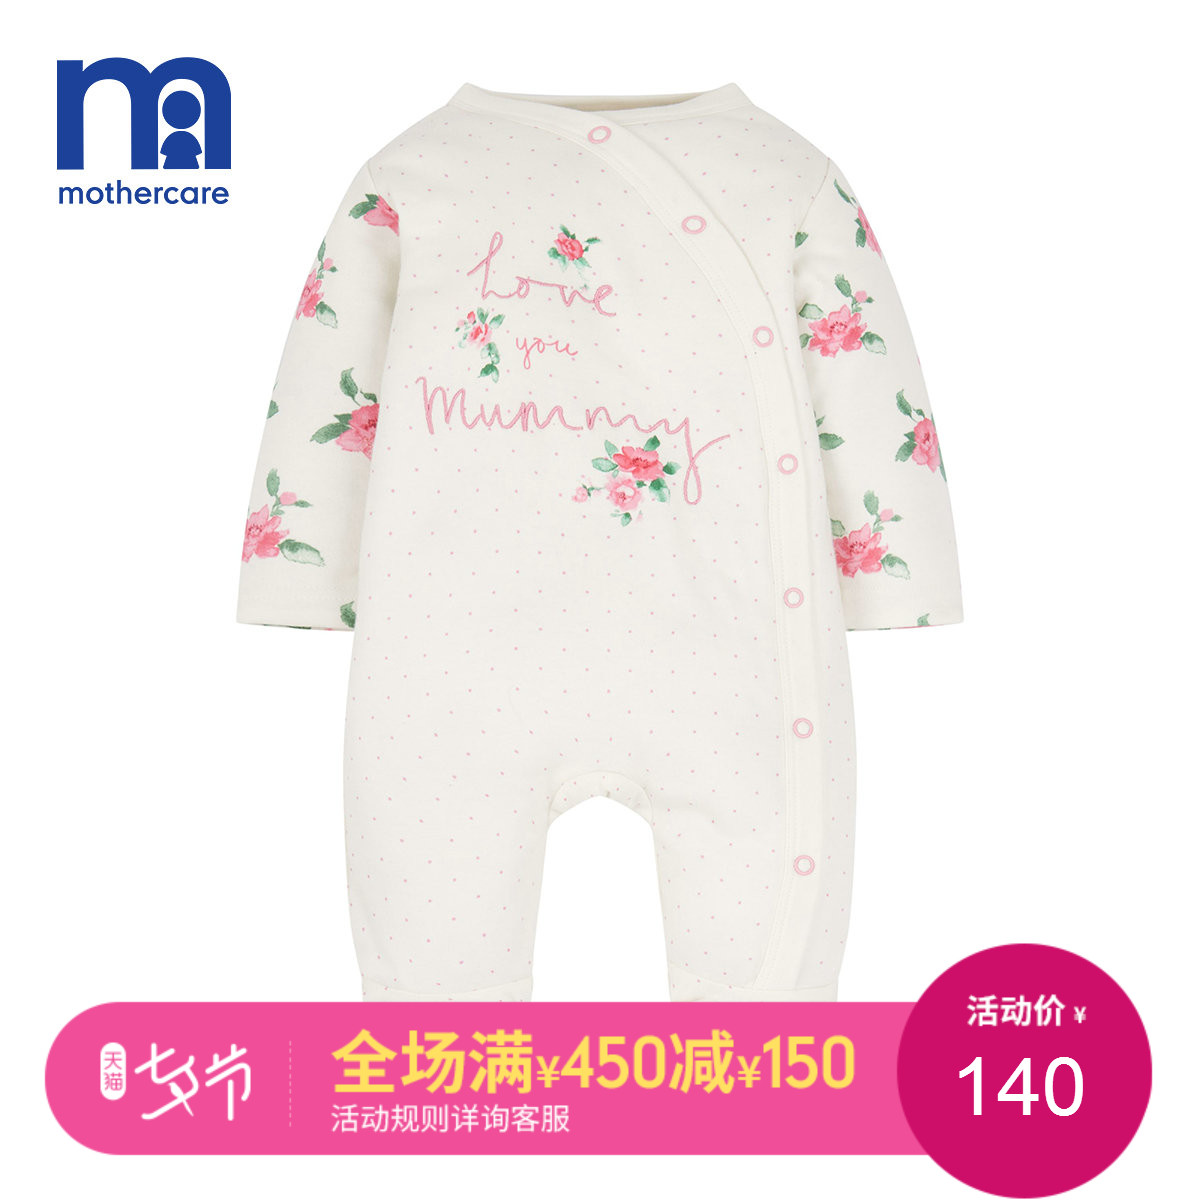 mothercare英国女婴针织连体衣新生儿宝宝春季新款棉质长袖连体衣